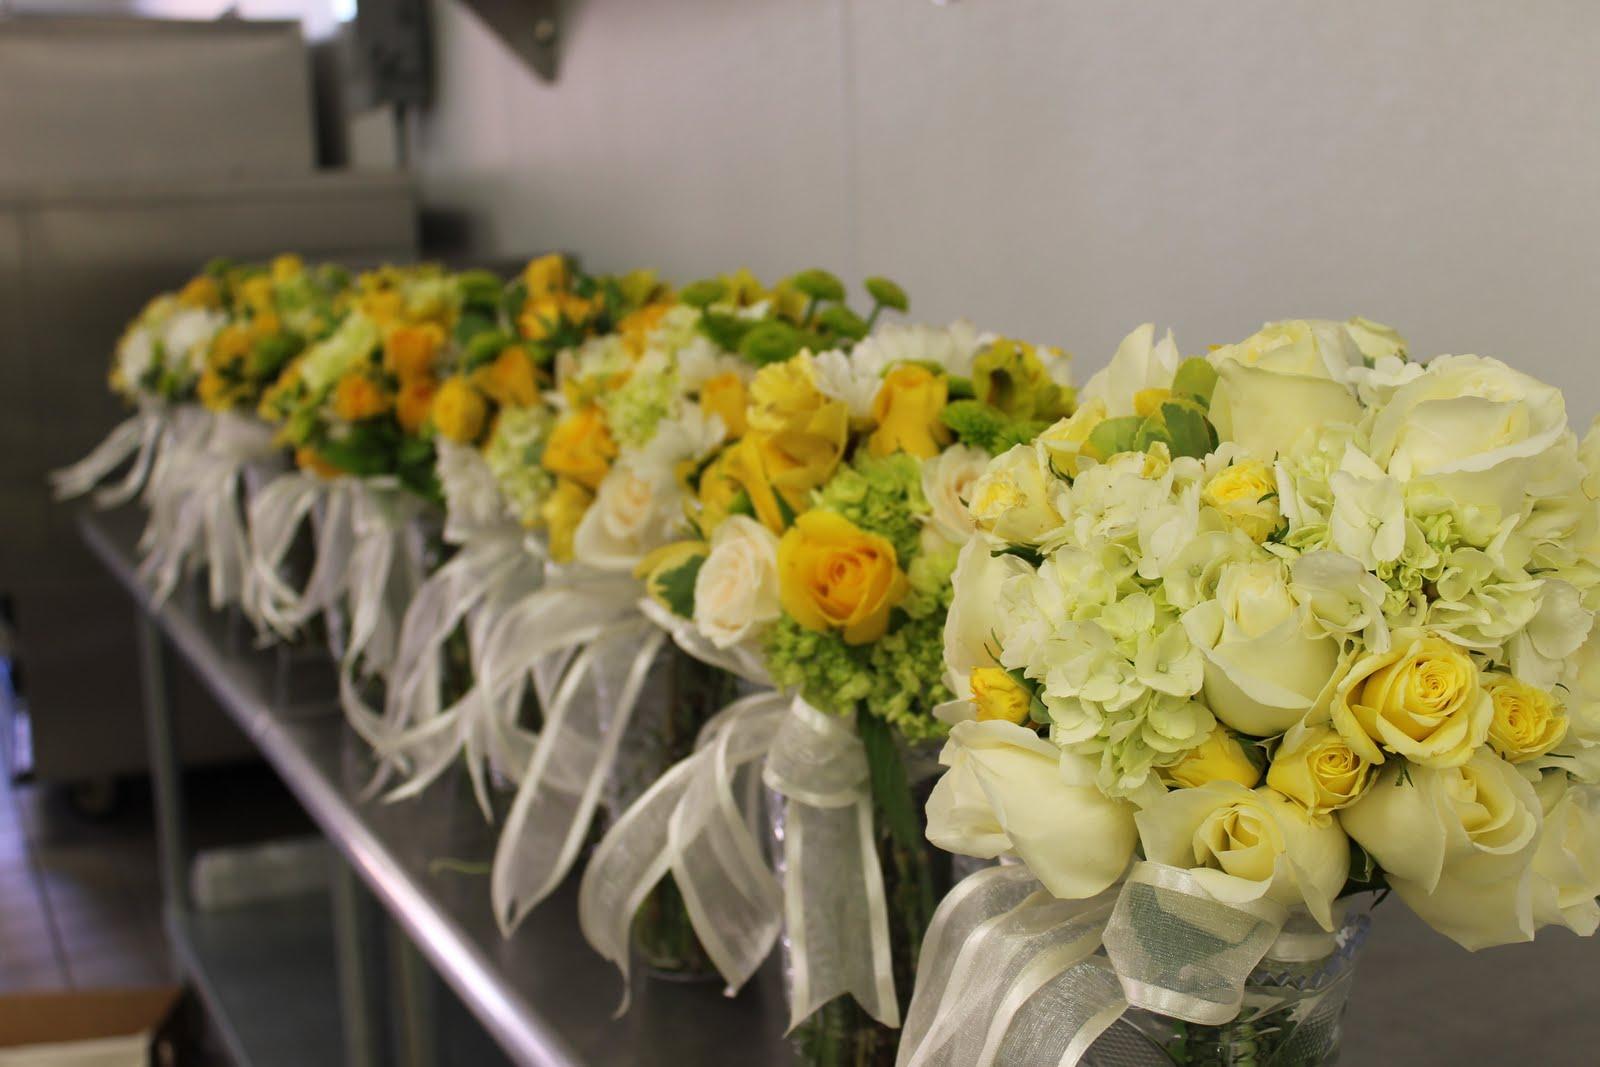 Miss Kopy Kat Hand Tied Bouquets